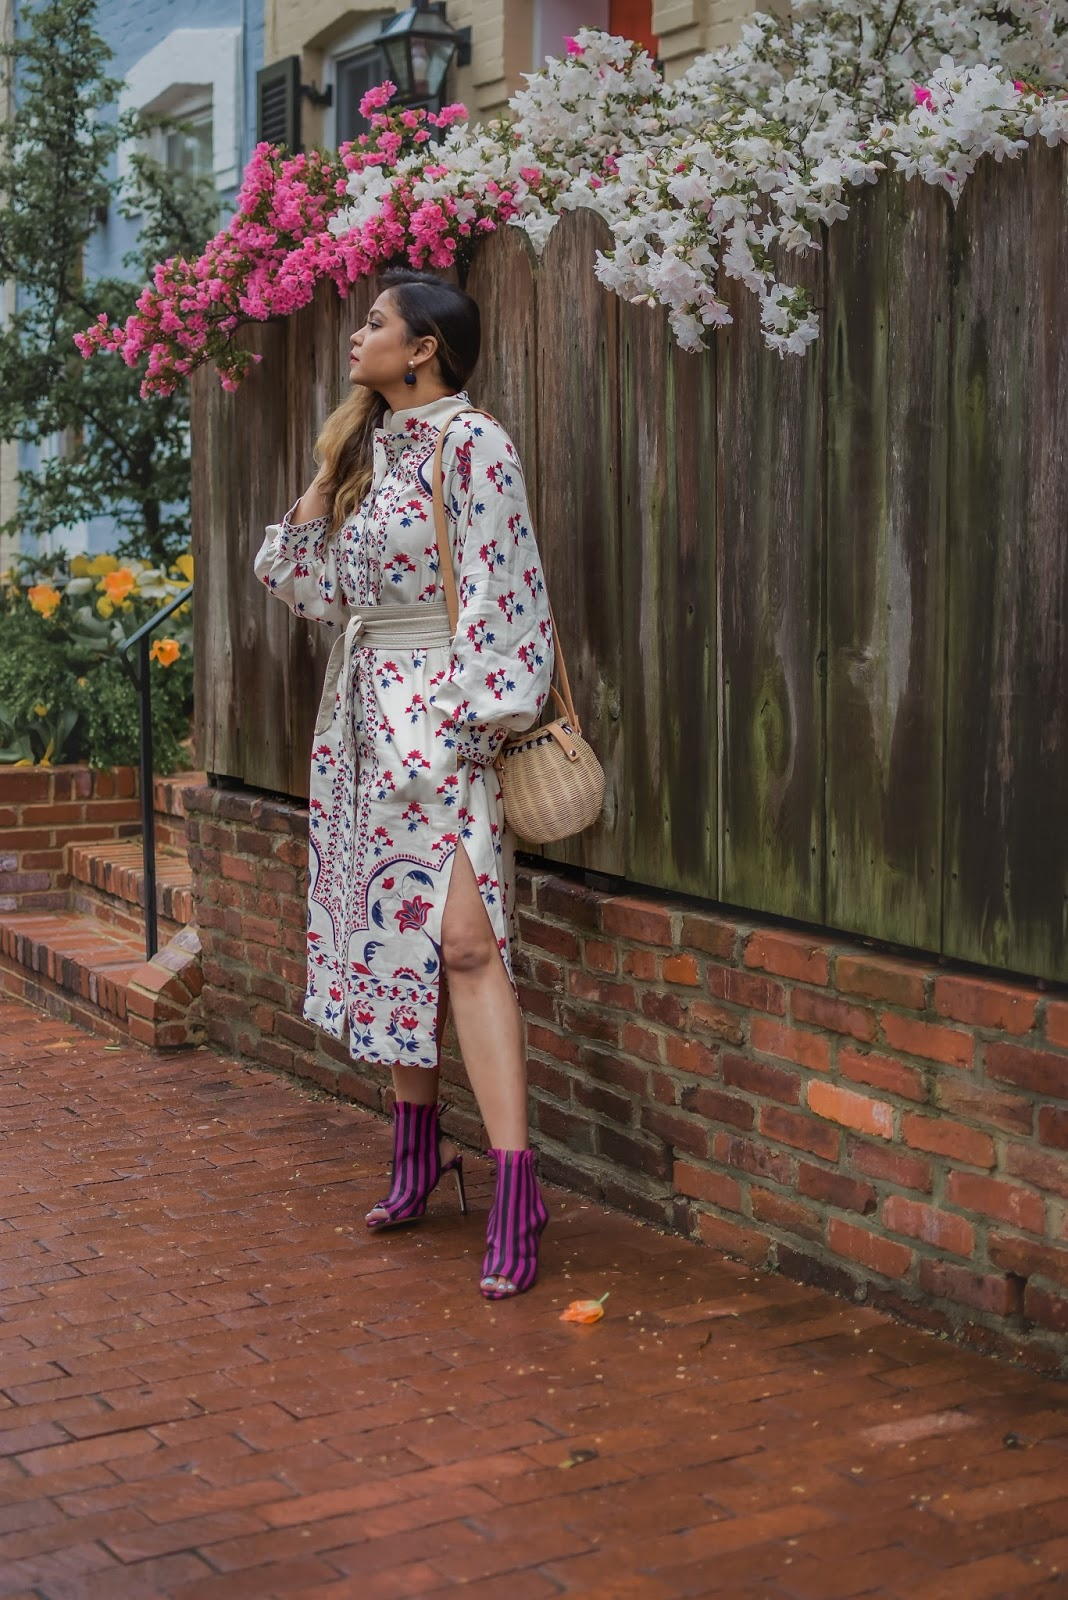 HM patterned dress, kimono dress, linen dress, printed kimono, obi belt, street style, spring look, print mixing, zara pink printed booties, wedding guest style, ratan bag, straw bag, myriad musings